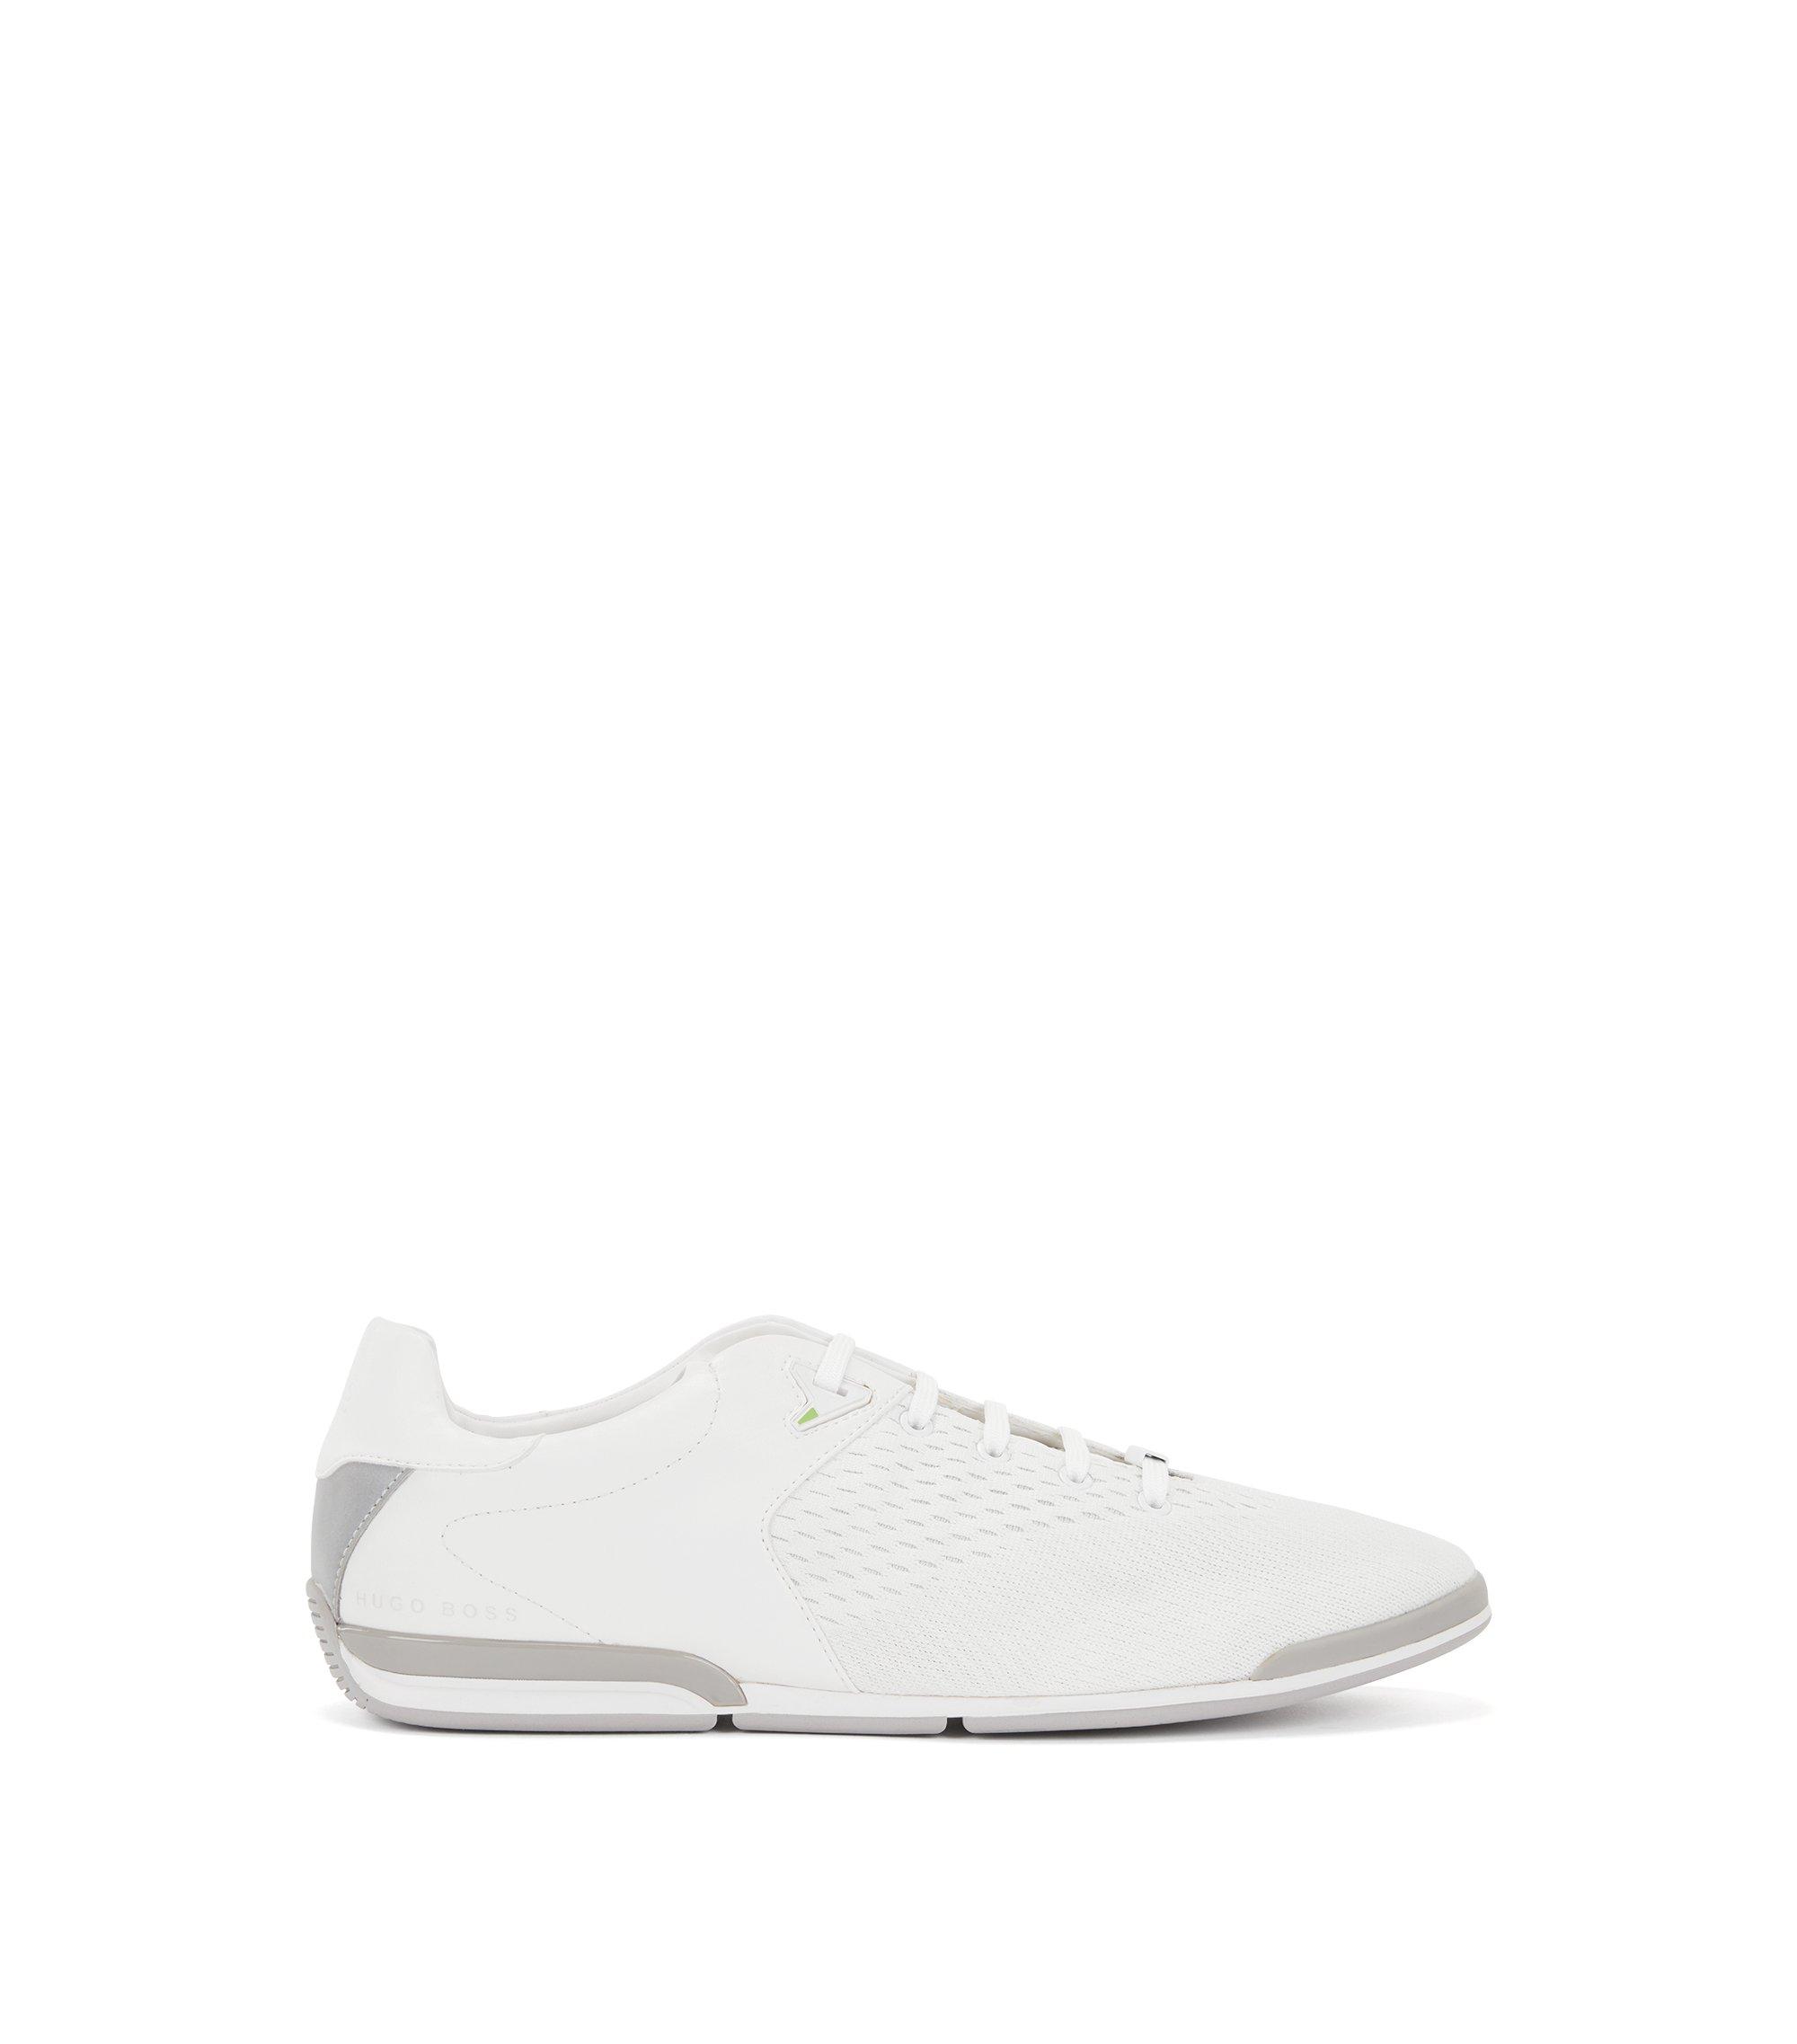 Lage sneakers met bovenzijde in jacquard, Wit